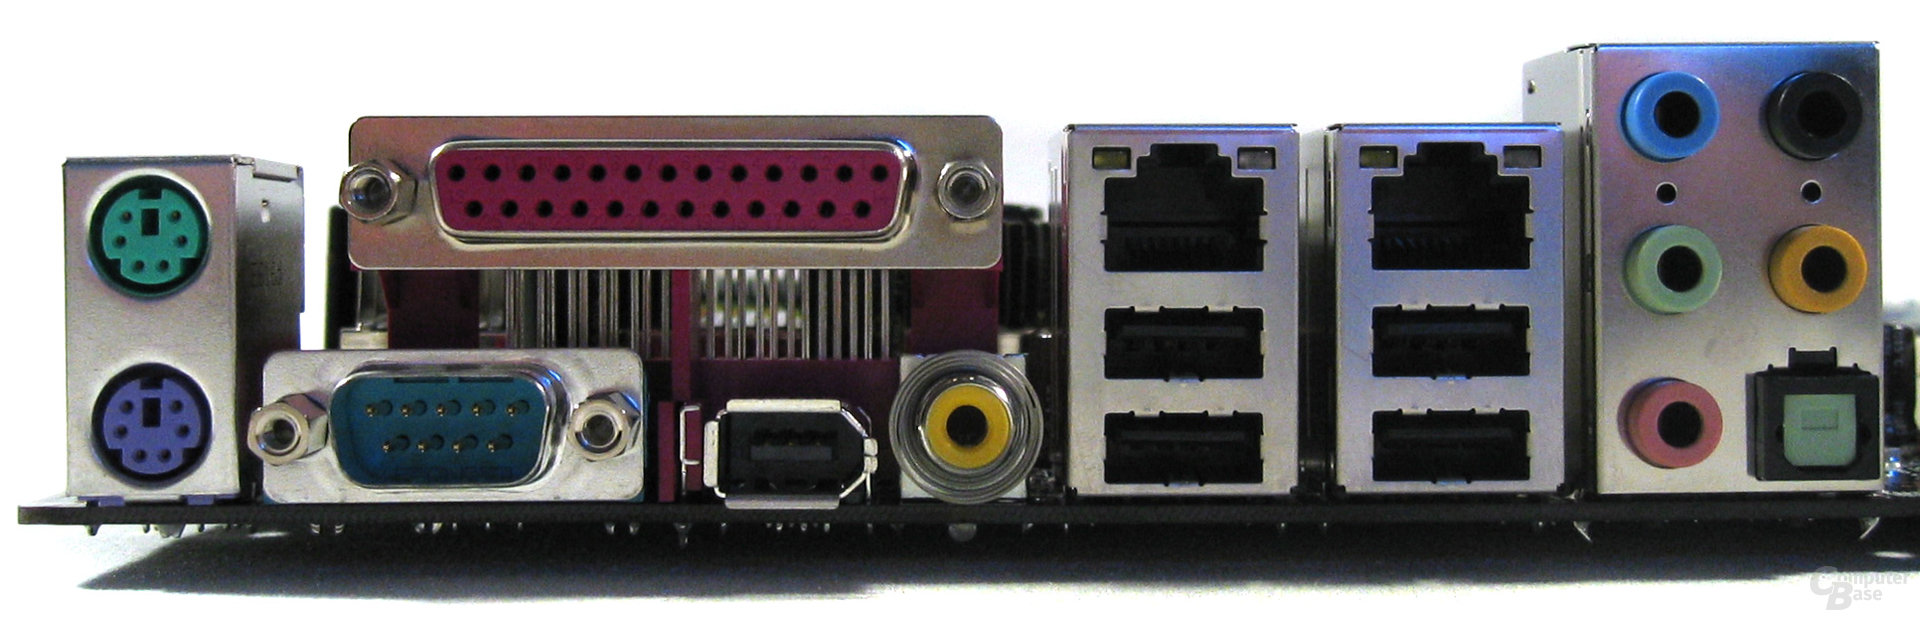 MSI K9N SLI Platinum ATX-Blende